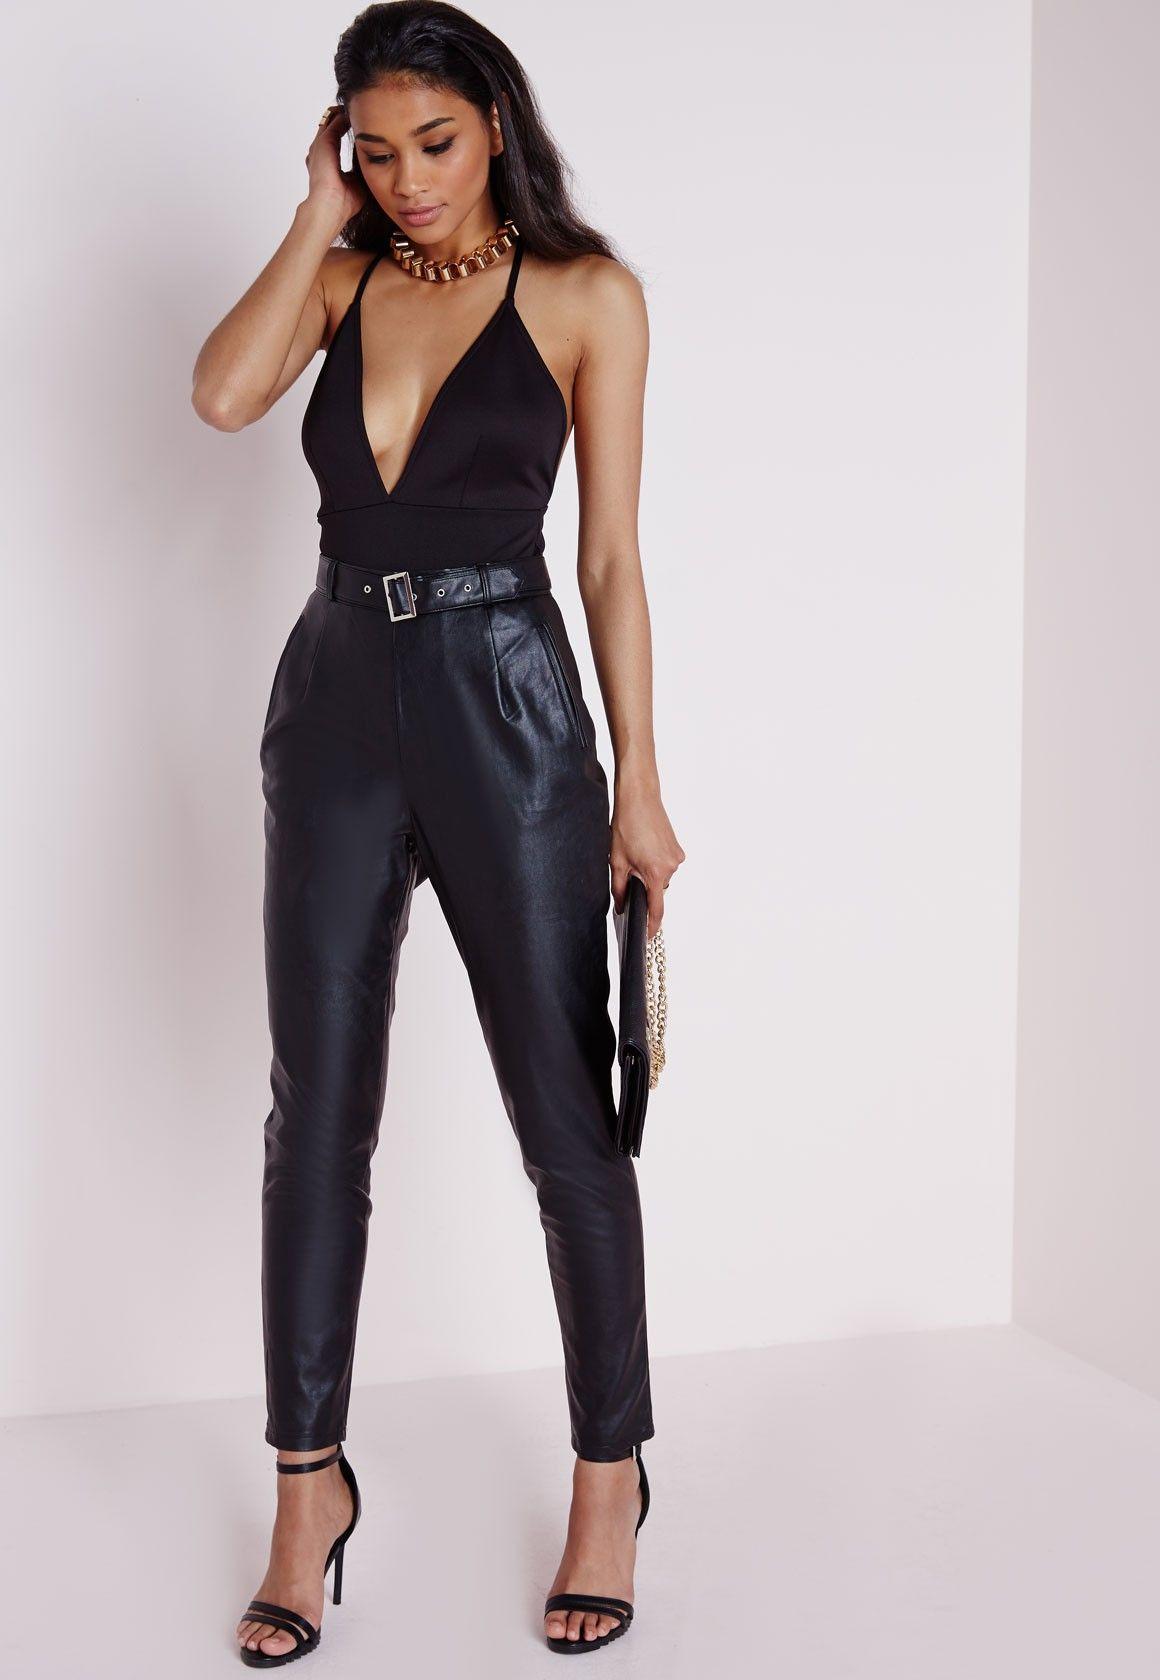 Missguided - Cross Back Plunge Bodysuit Black   Black ...